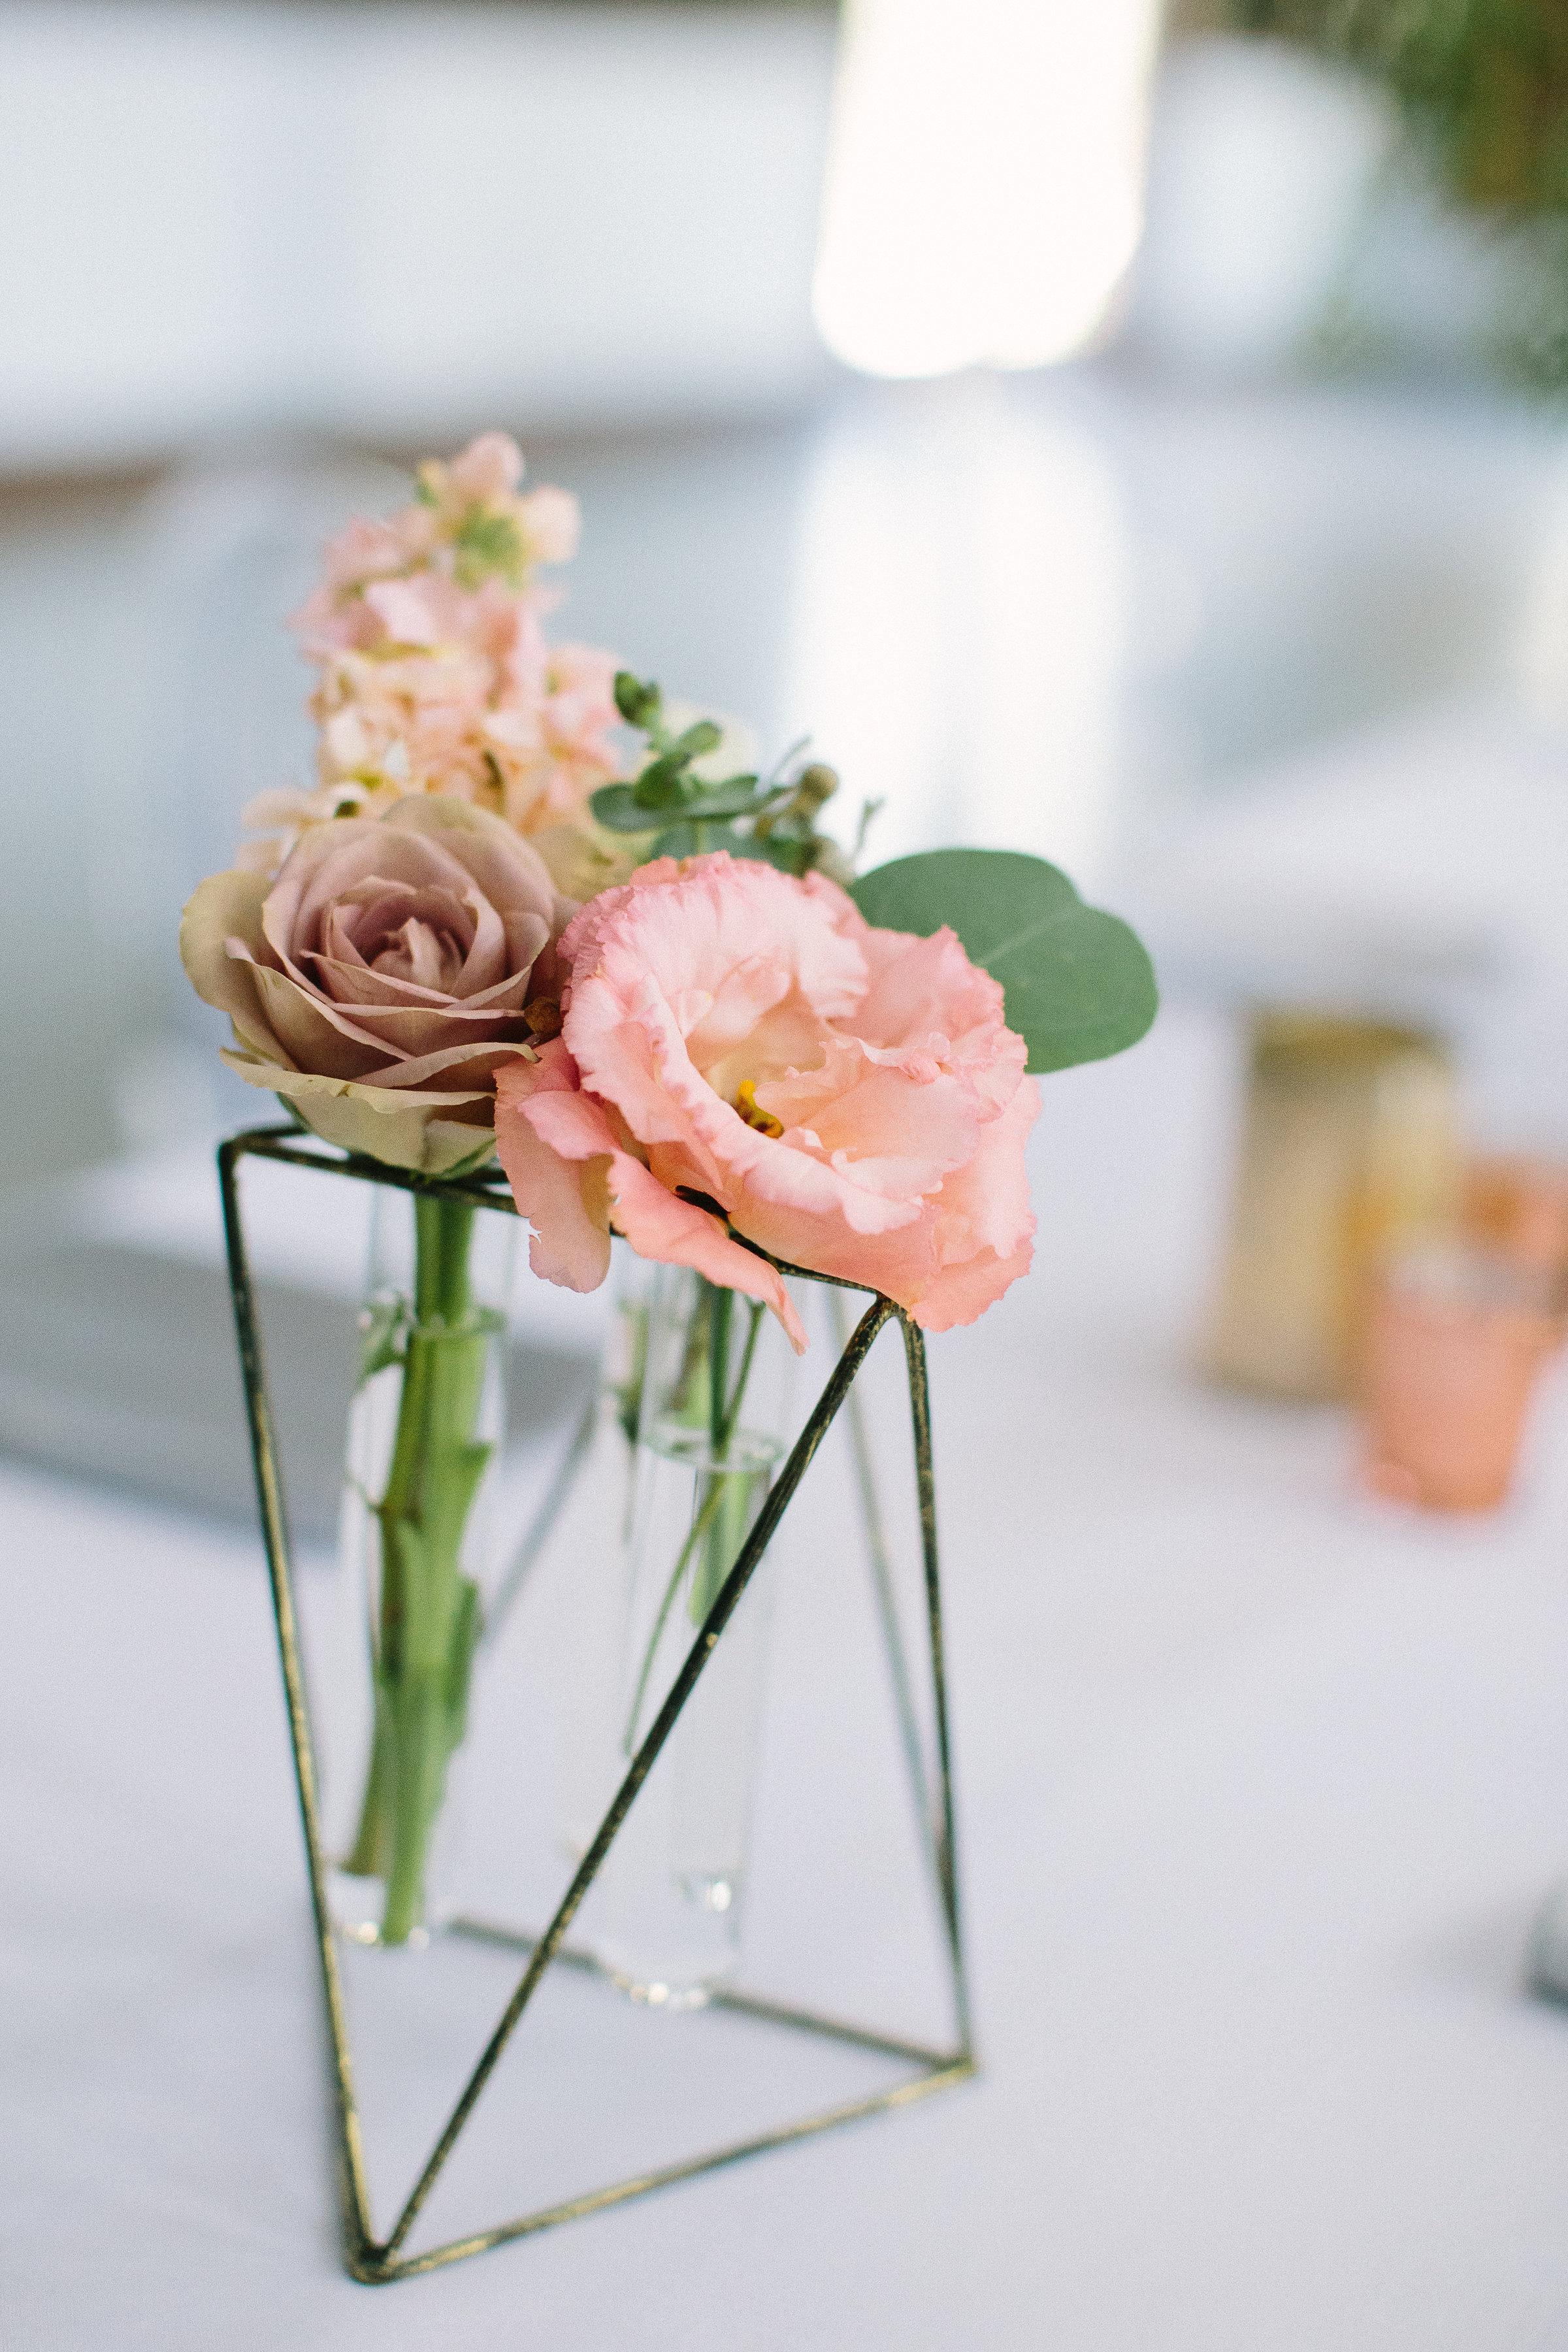 Ellen-Ashton-Photography-Peach-Creek-Ranch-Weddings-Wed-and-Prosper73